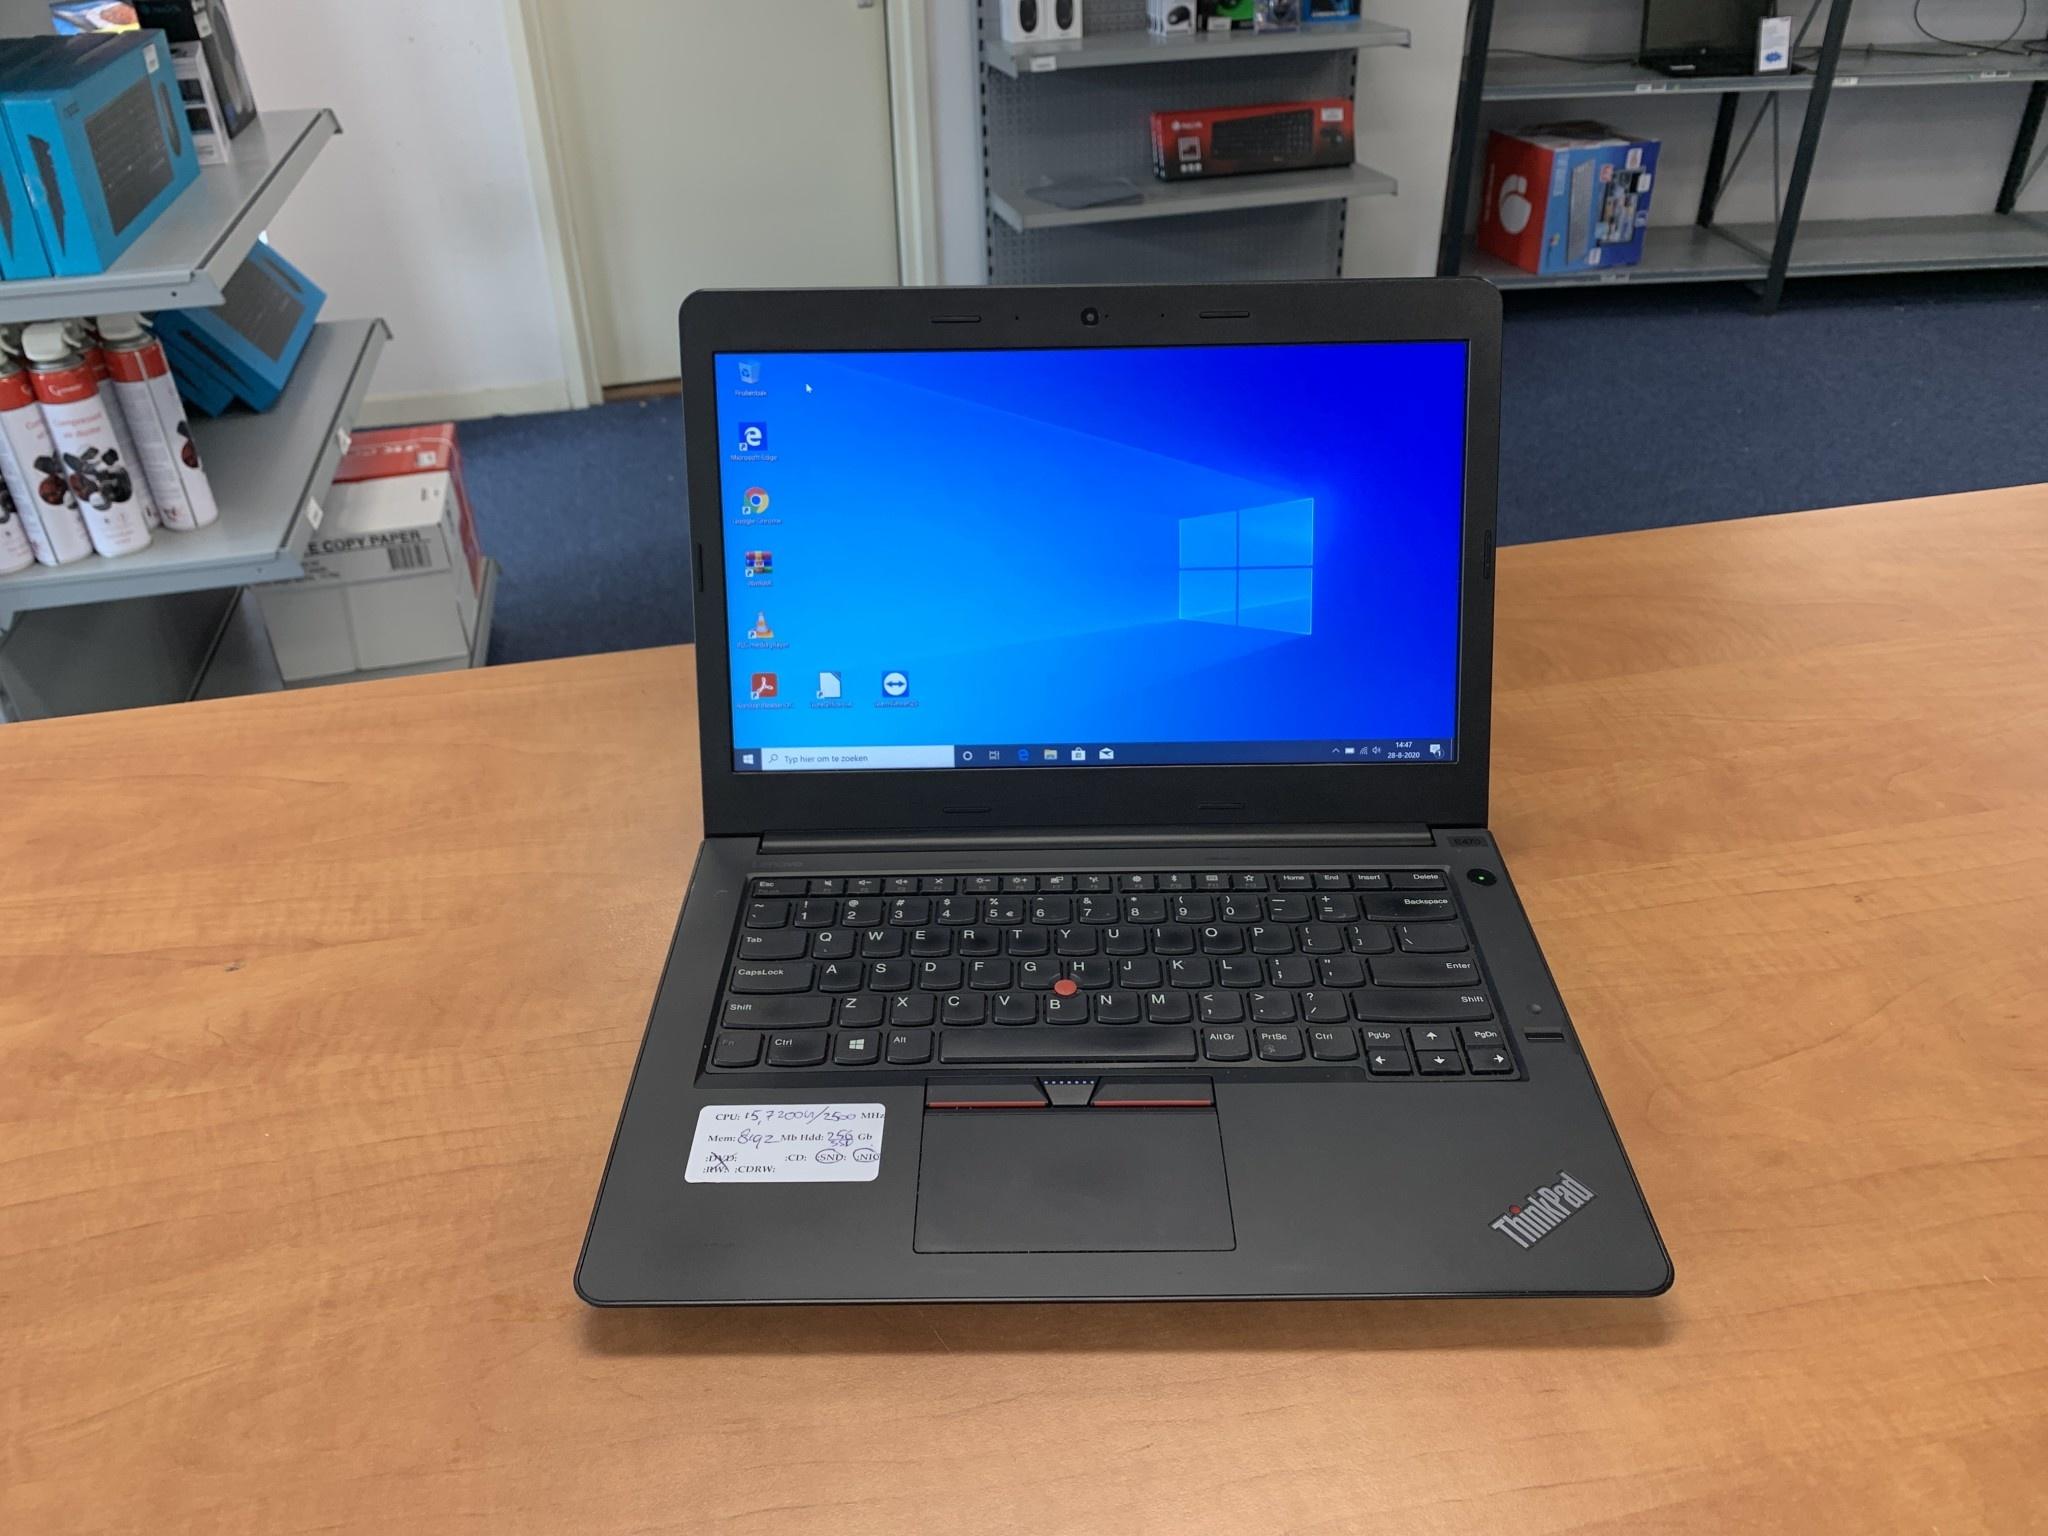 Lenovo Thinkpad E470 I5 8Gb 256Gb SSD 14 inch W10P laptop